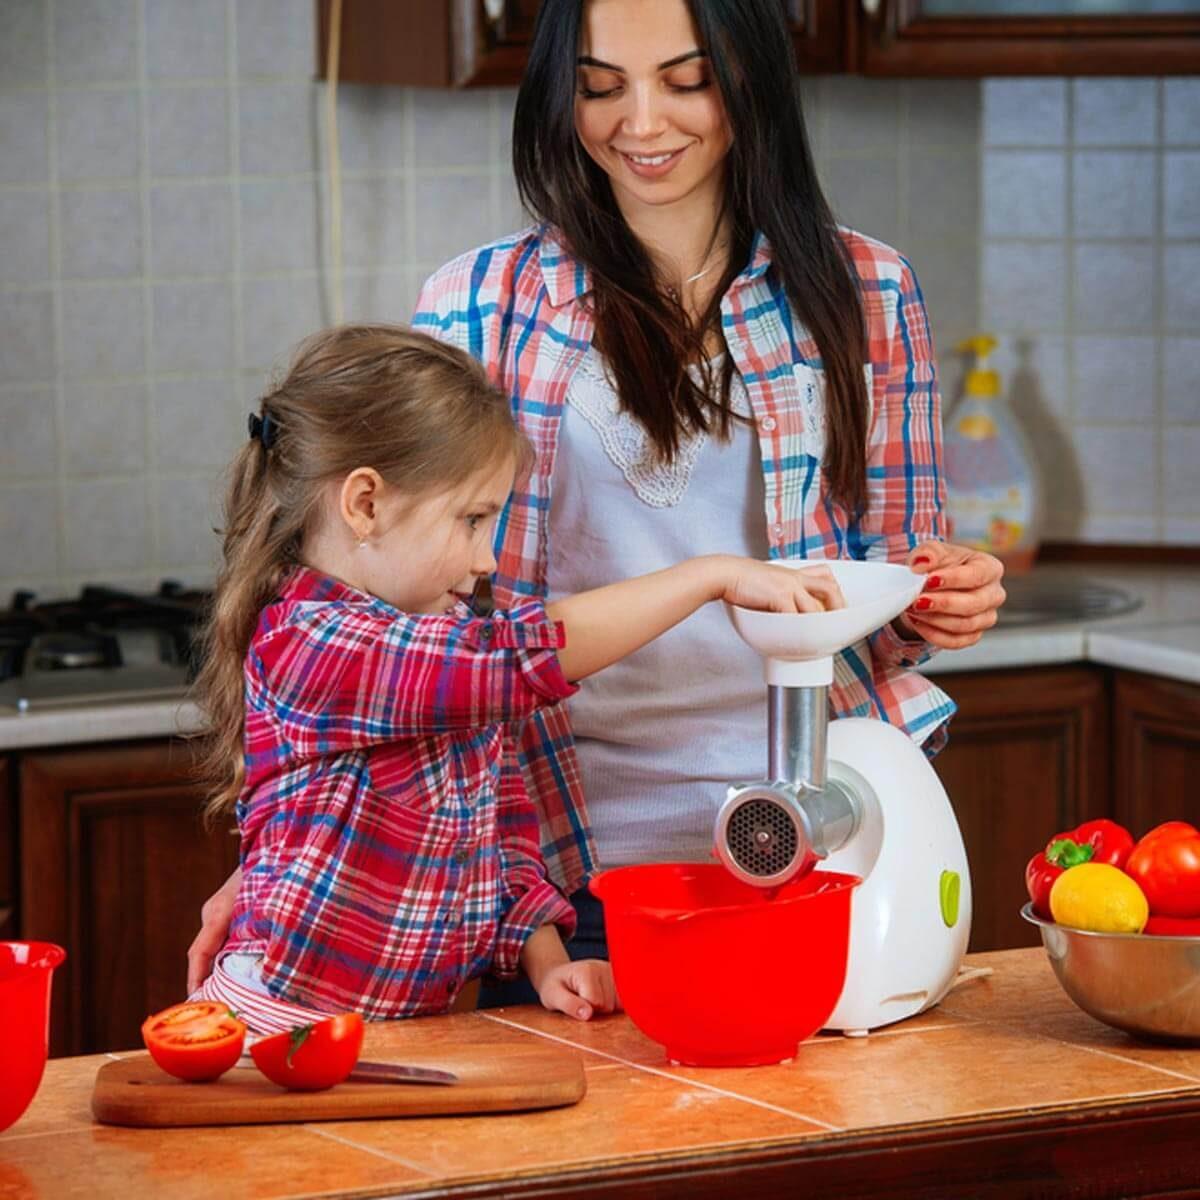 Child-Sized Bakeware